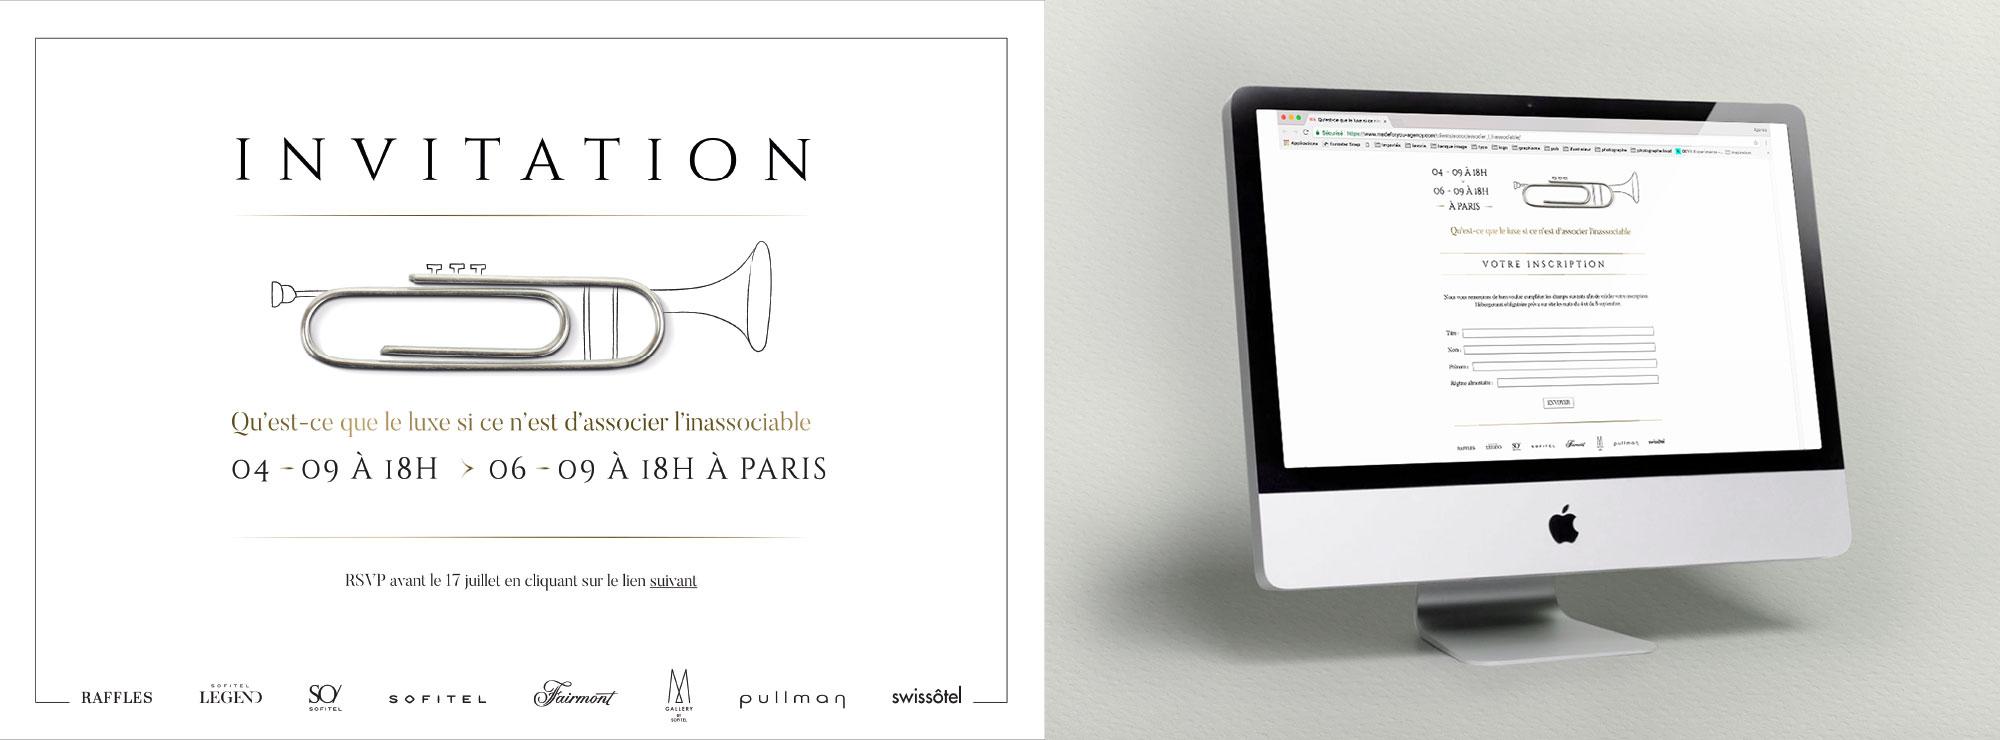 01.accorhotels_convention_invitation_formulaire_inscription